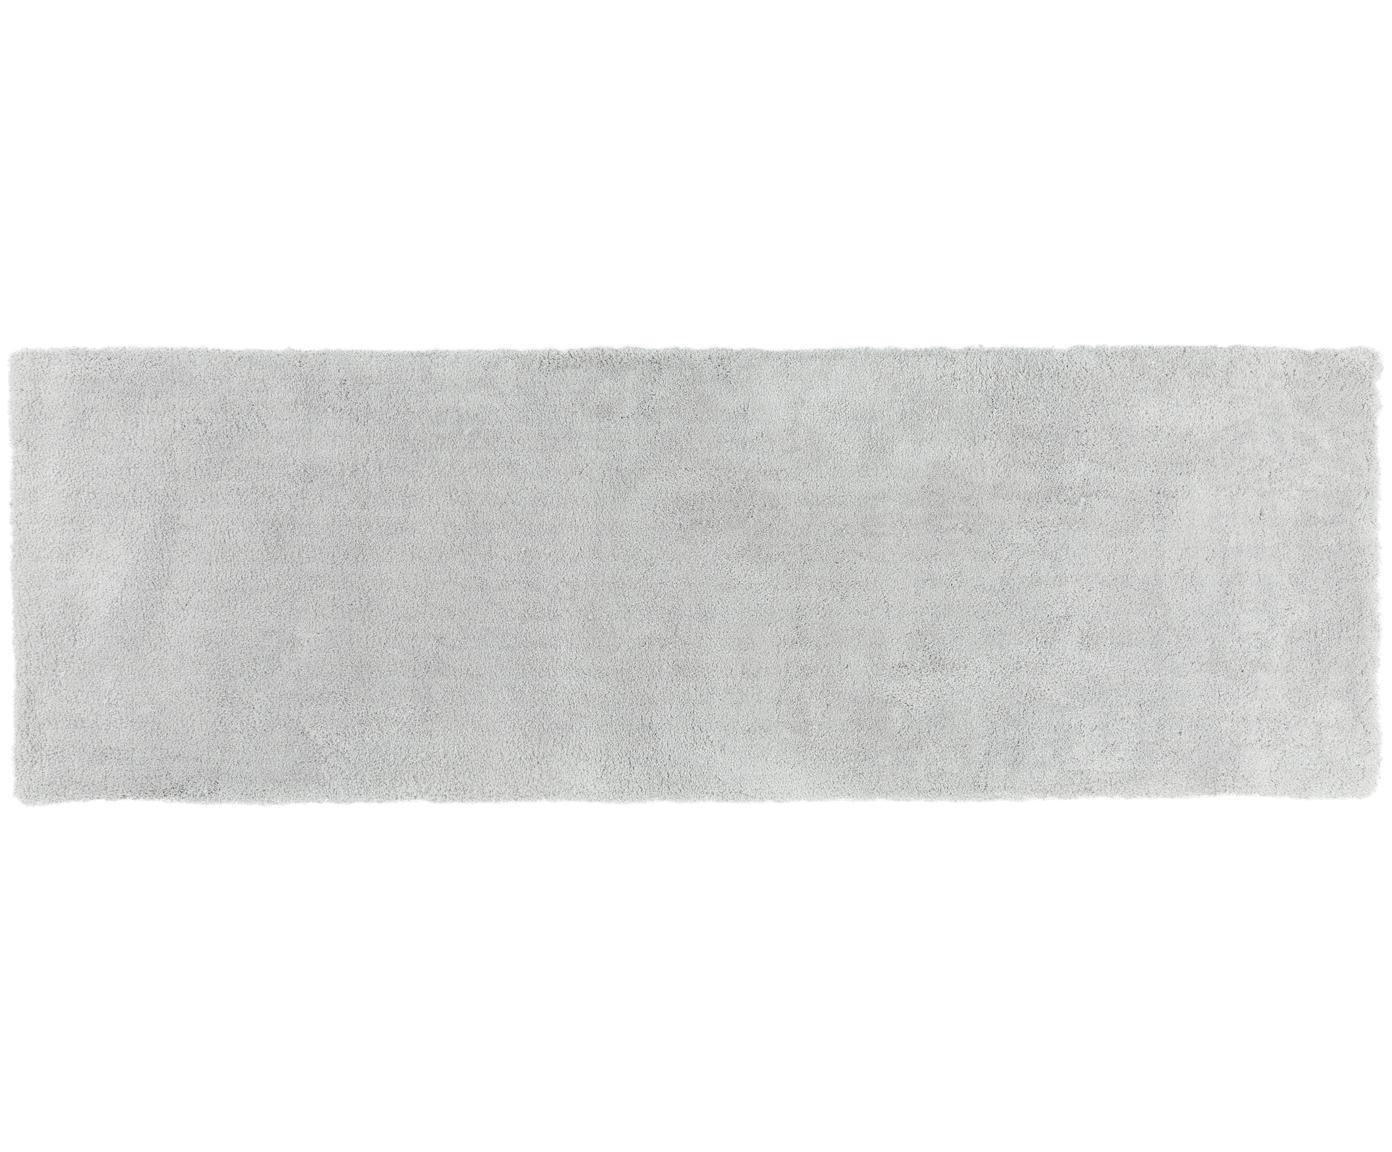 Loper Leighton, Bovenzijde: 100% polyester (microveze, Onderzijde: 100% polyester, Lichtgrijs, 80 x 250 cm